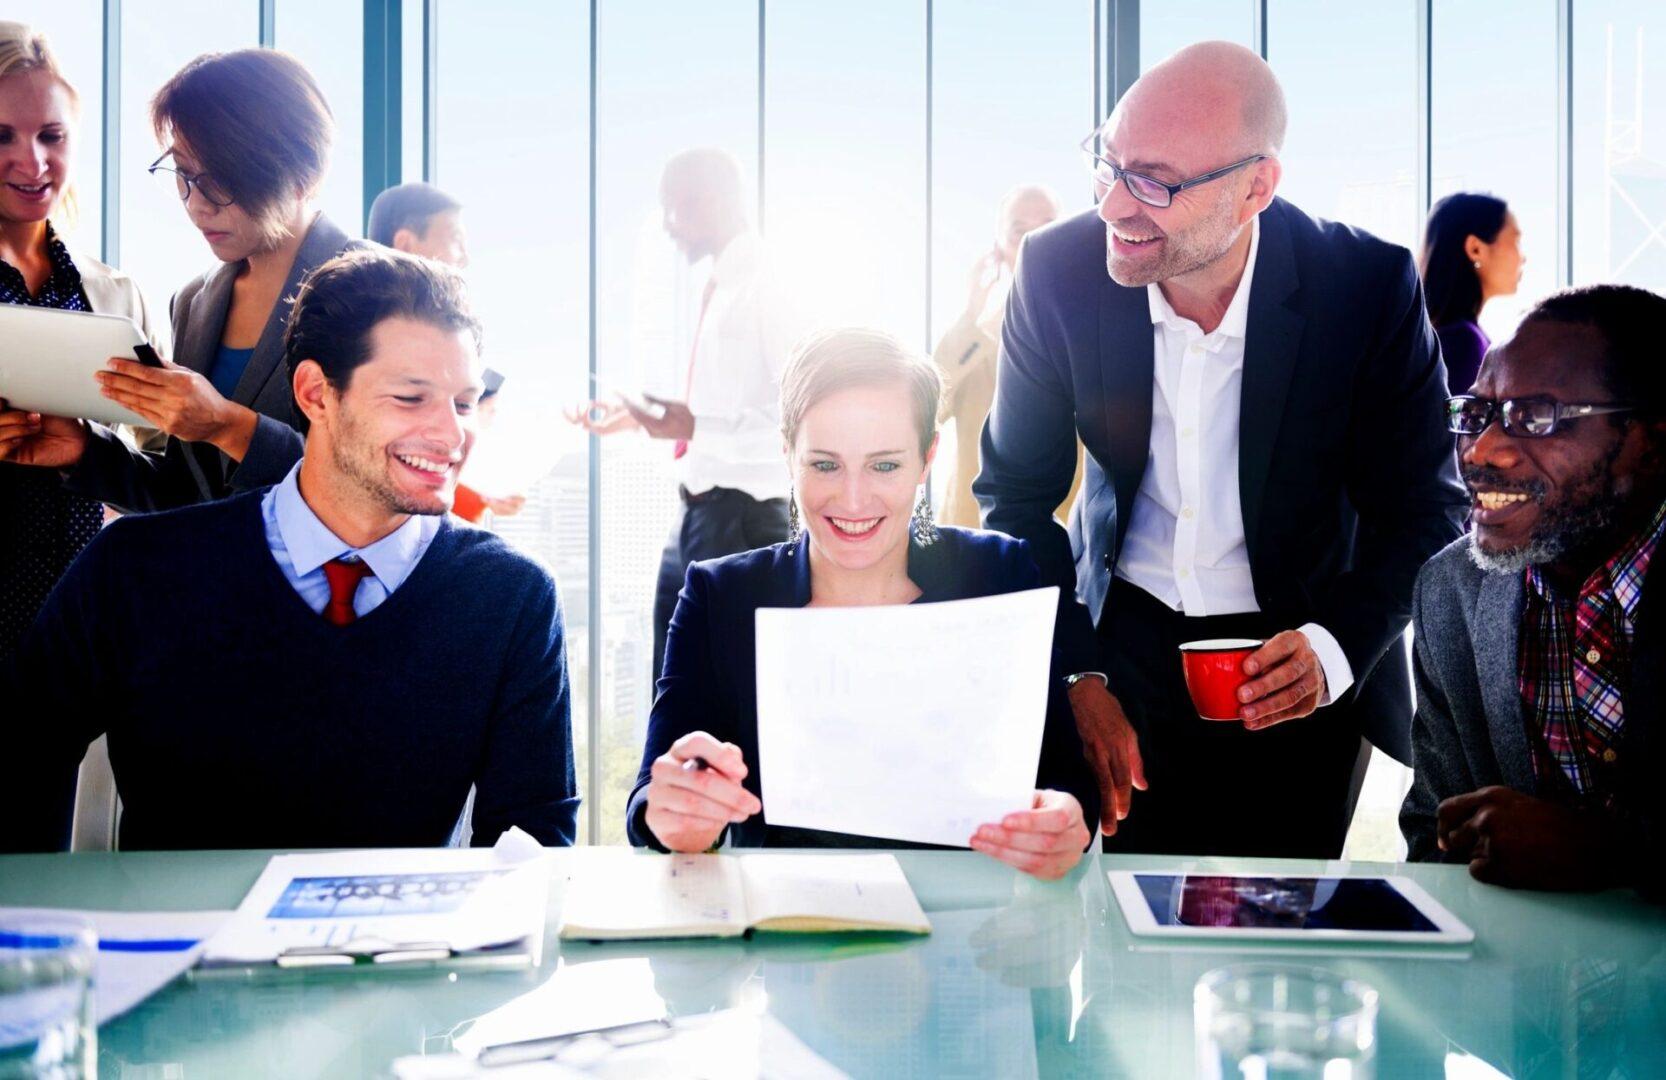 Management reviewing plans